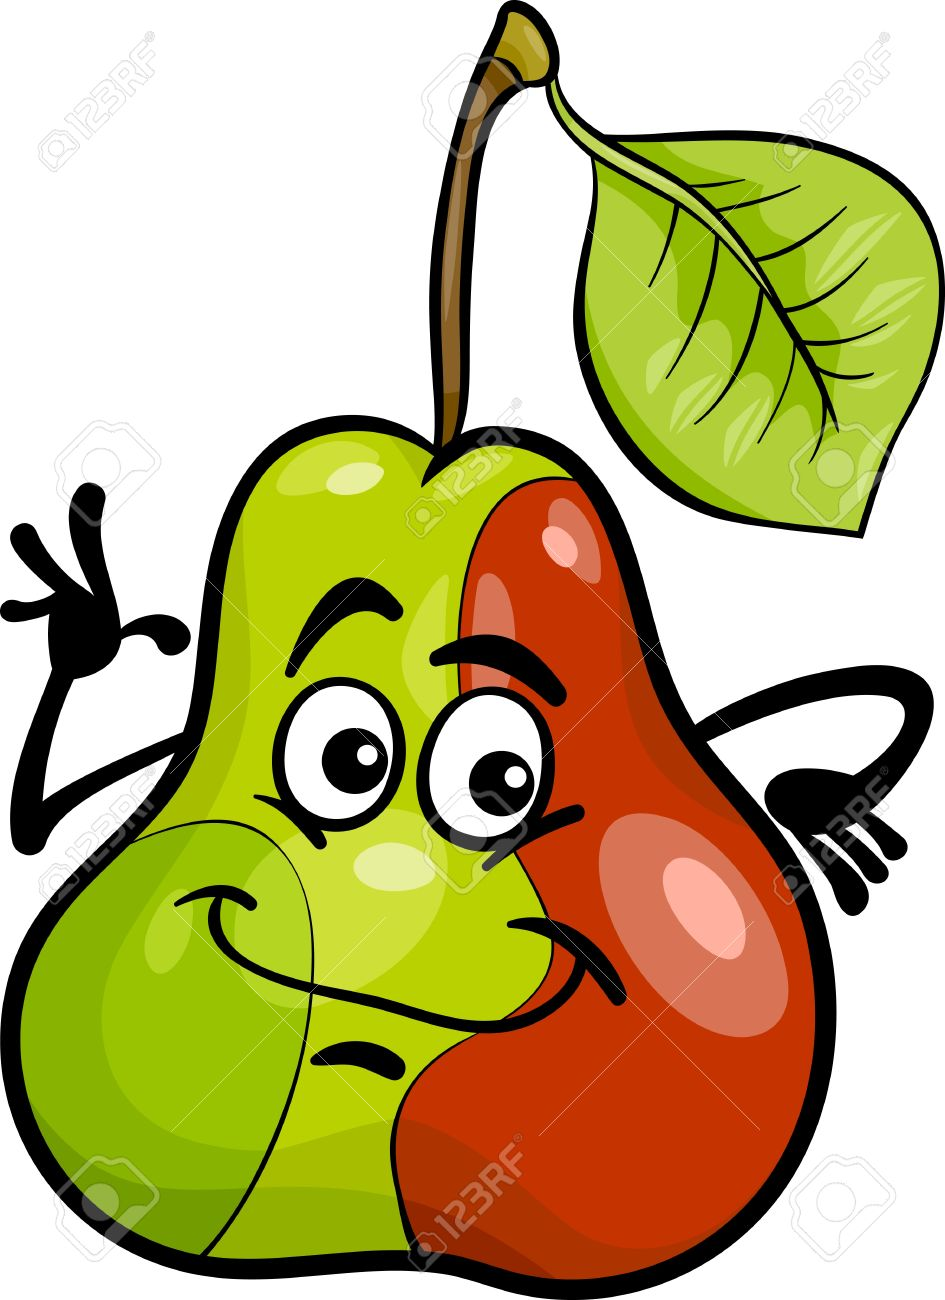 Cartoon Illustration Of Funny Pear Fruit Food Comic Character.